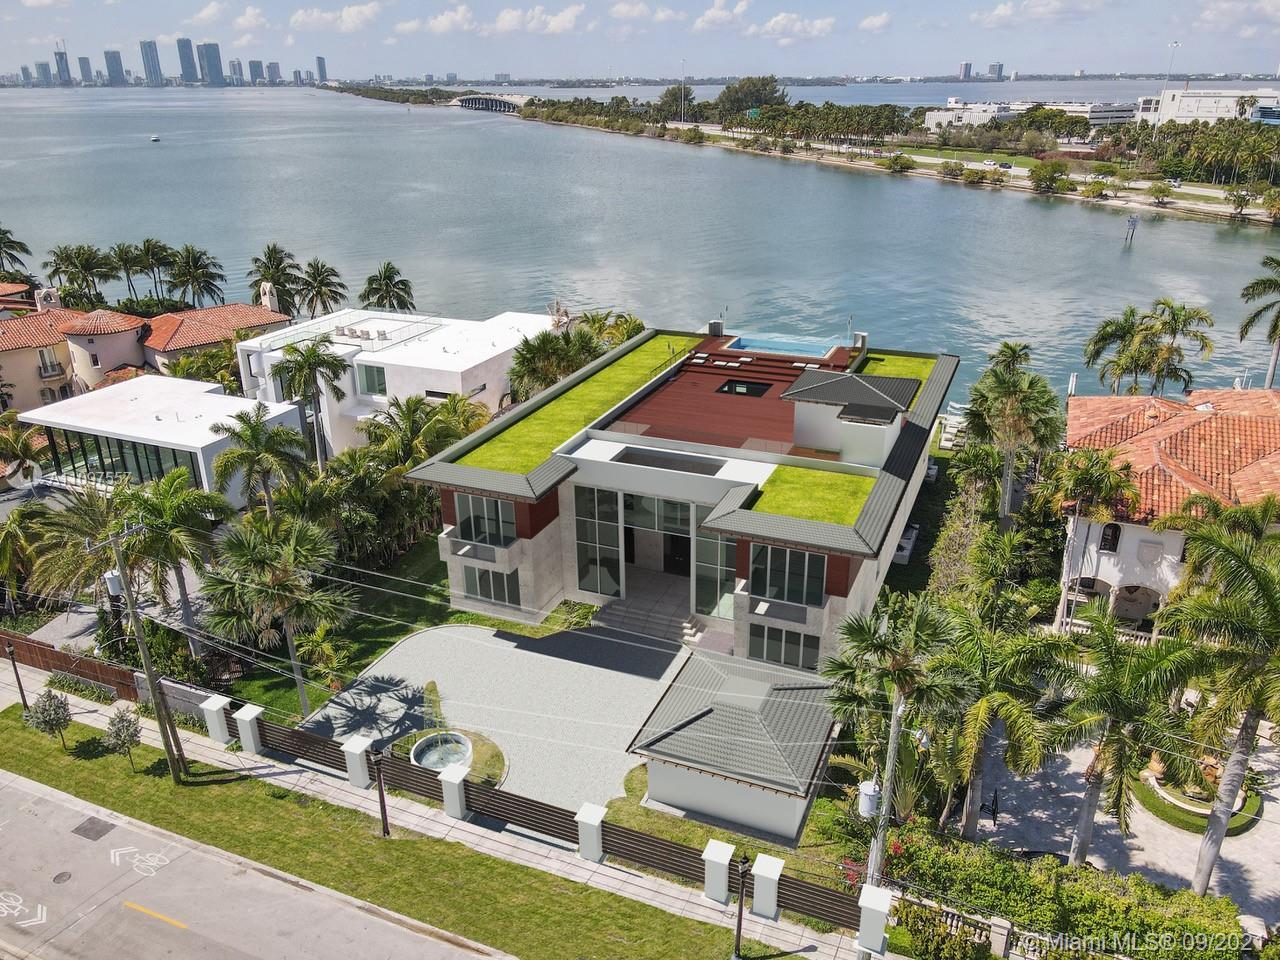 Sunset Lake - 3100 N Bay Rd, Miami Beach, FL 33140